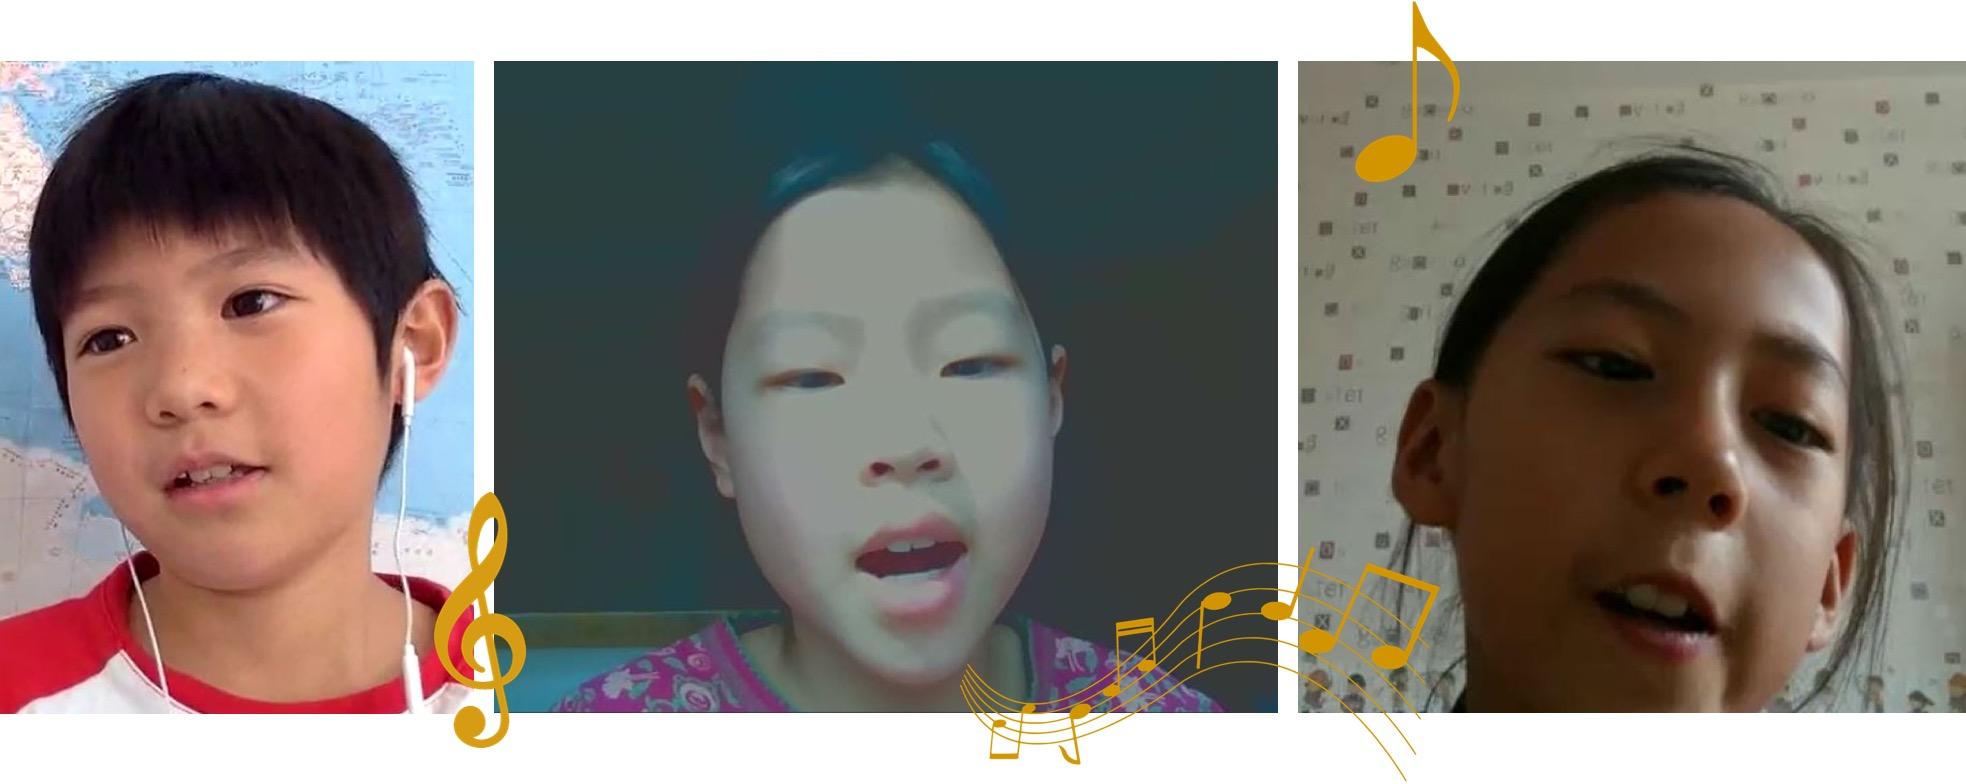 js-online-learning-singing